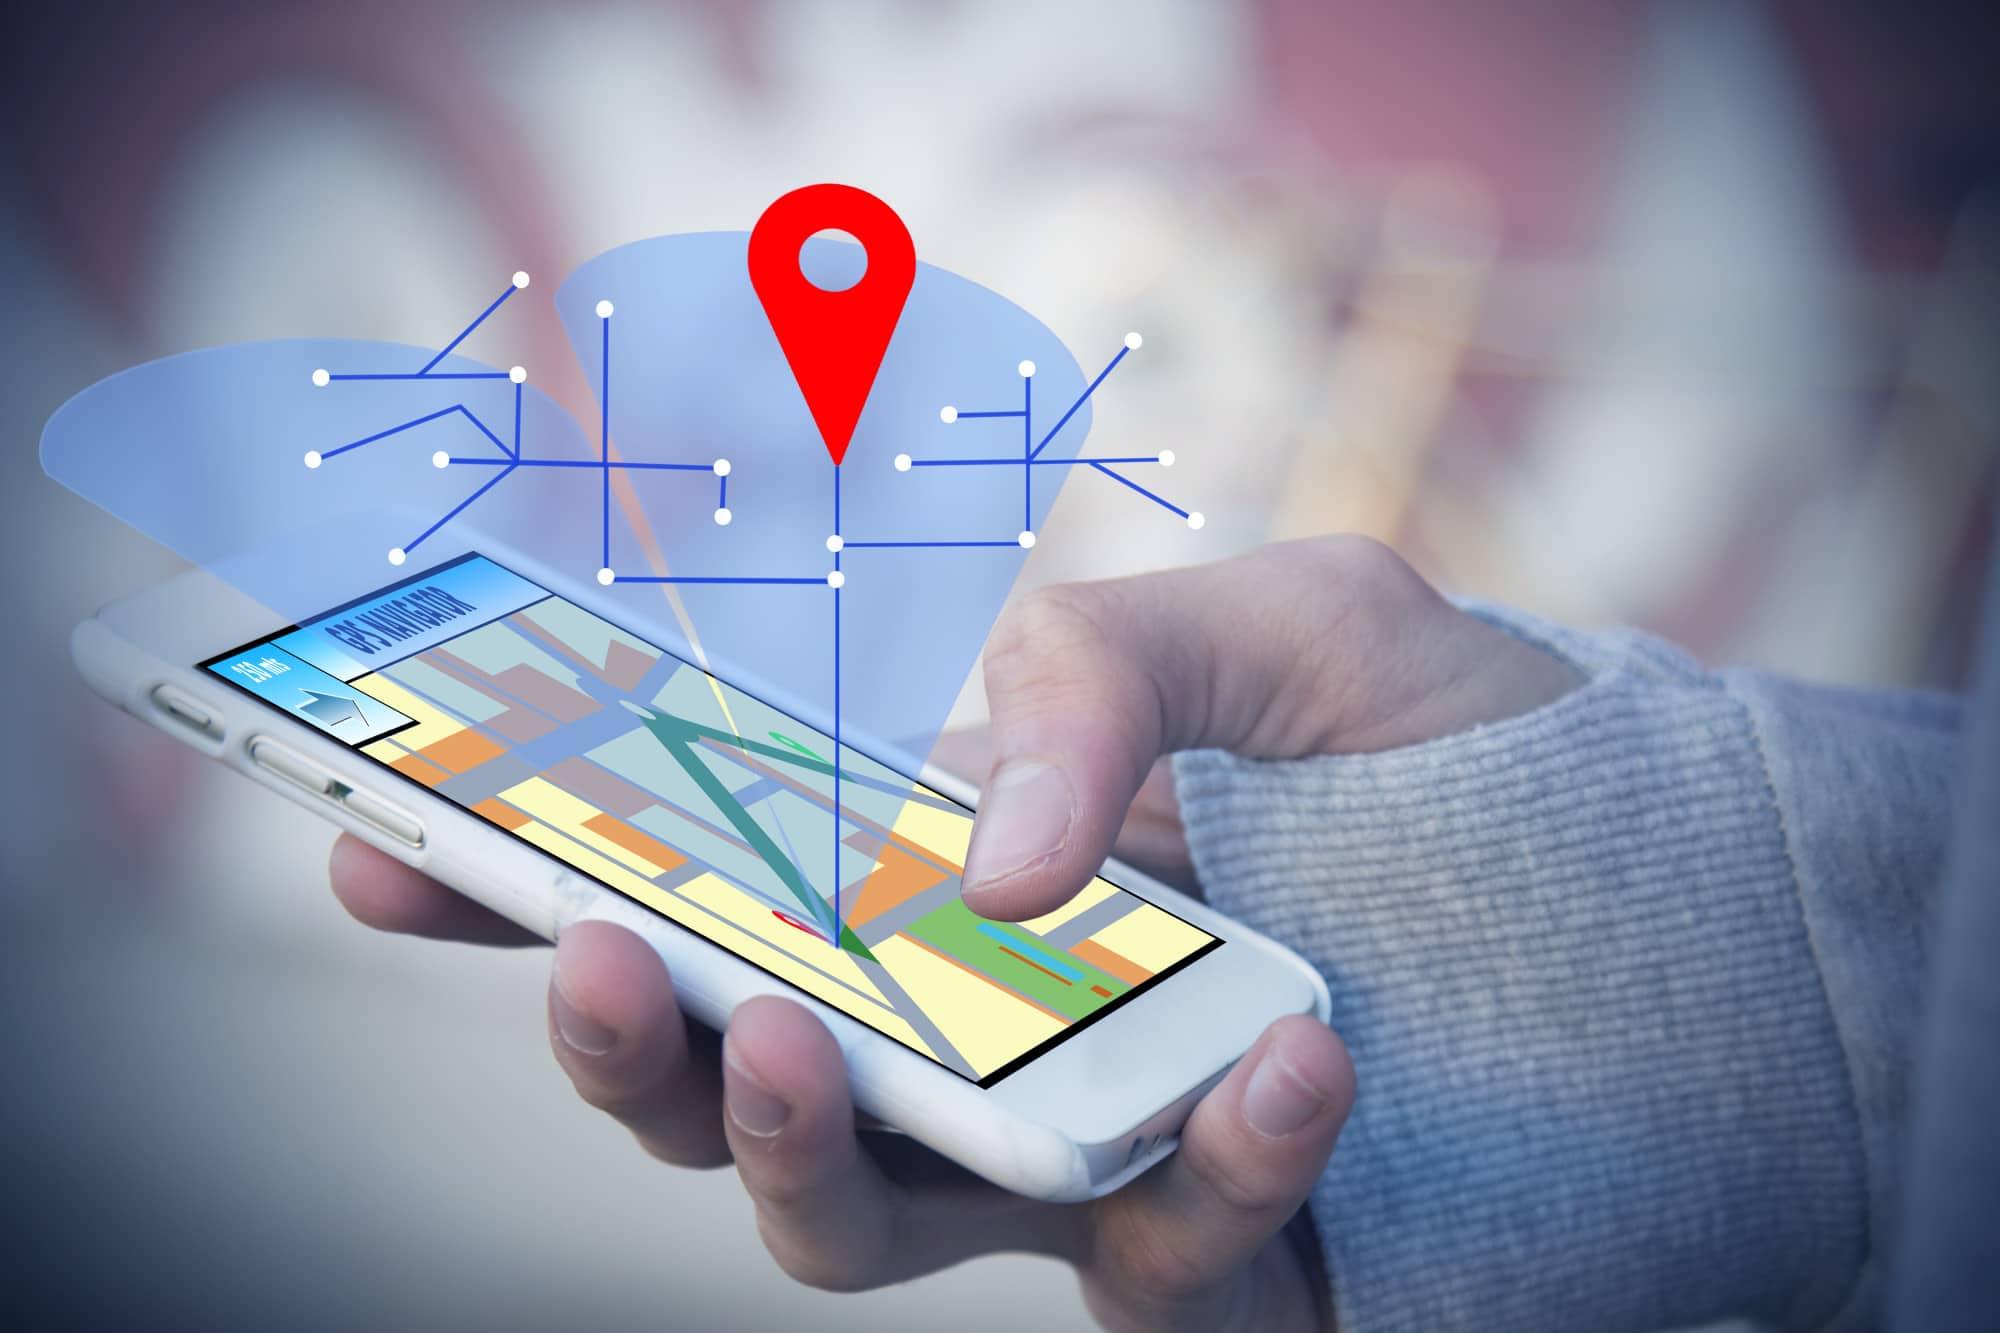 GPS monitoring device